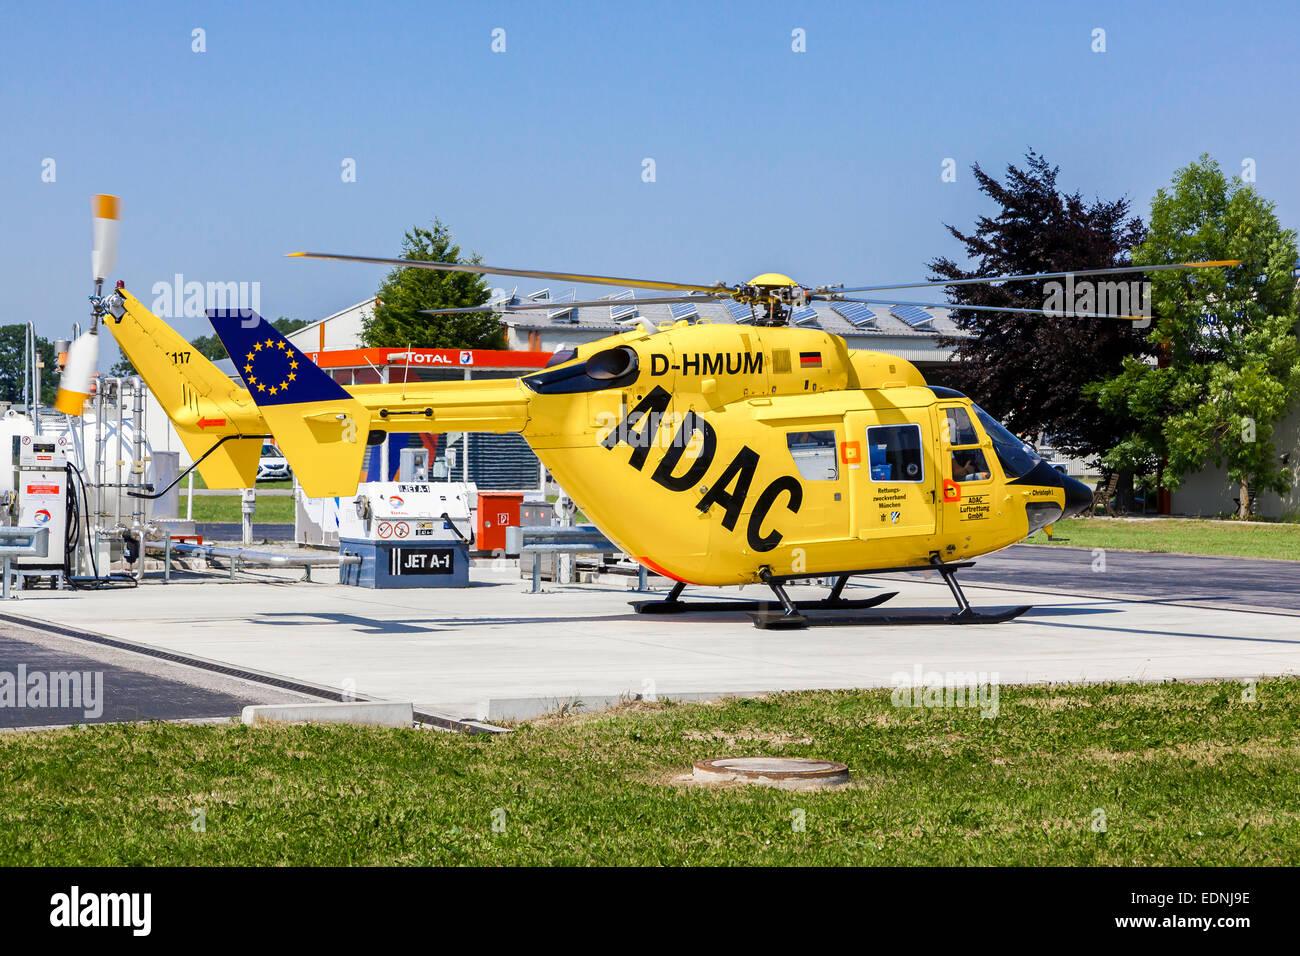 ADAC rescue helicopter Christoph 1 at the refuelling station at Landshut-Ellermühle Airport, Landshut, Bavaria, - Stock Image